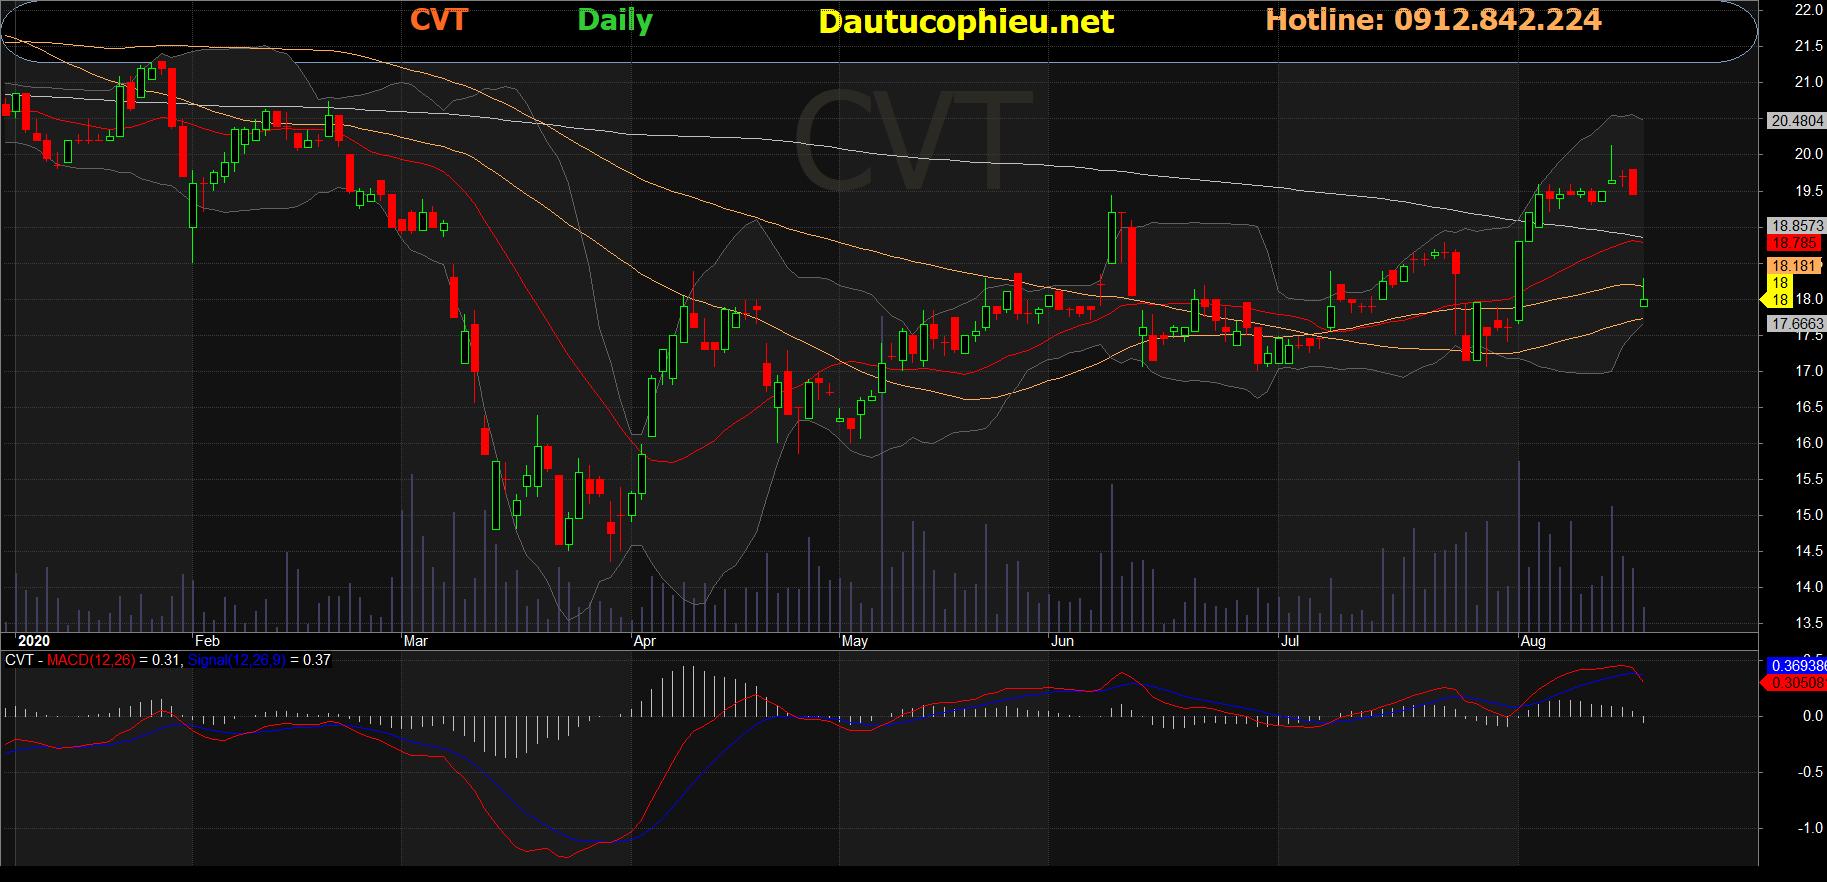 Cổ phiếu CVT